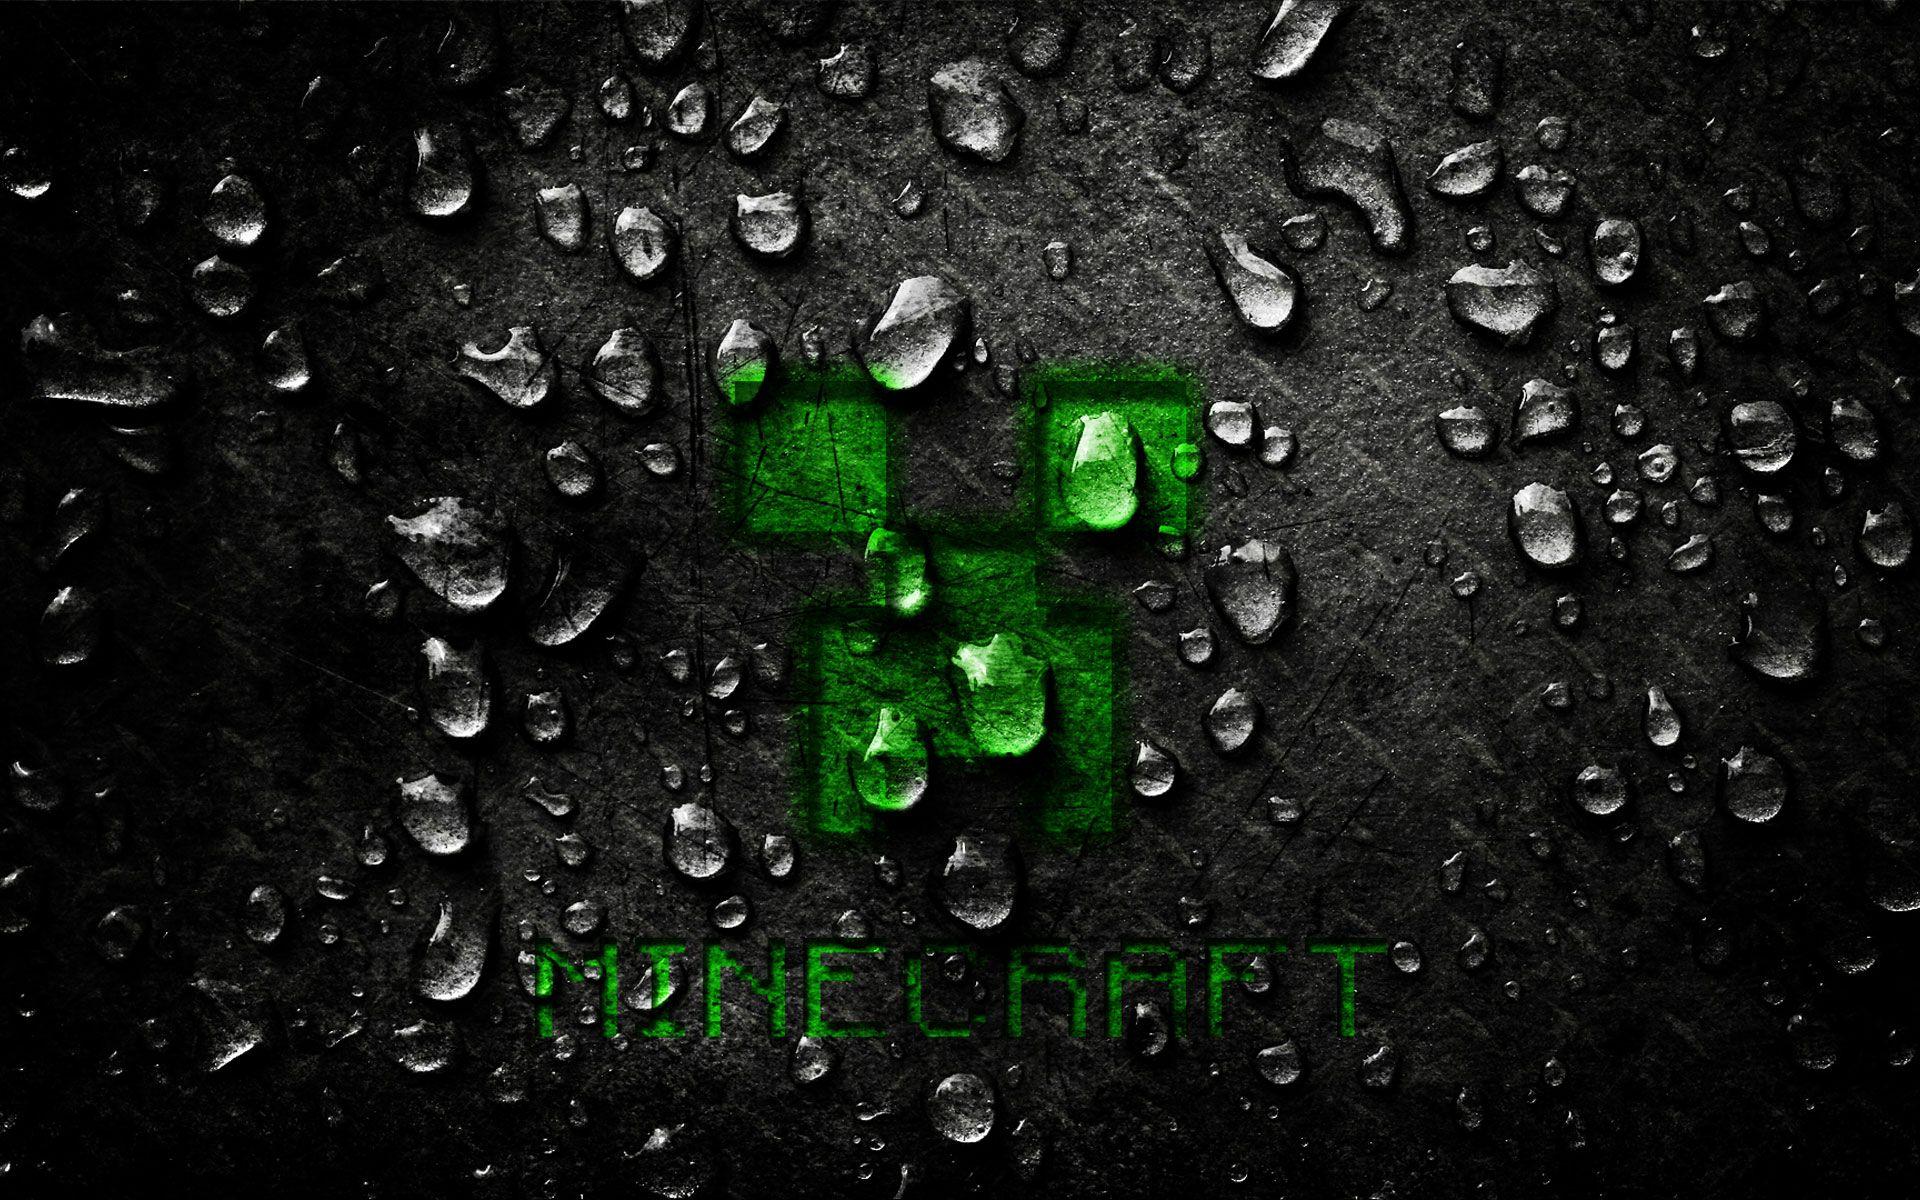 55 Minecraft Backgrounds For Desktop On Wallpapersafari